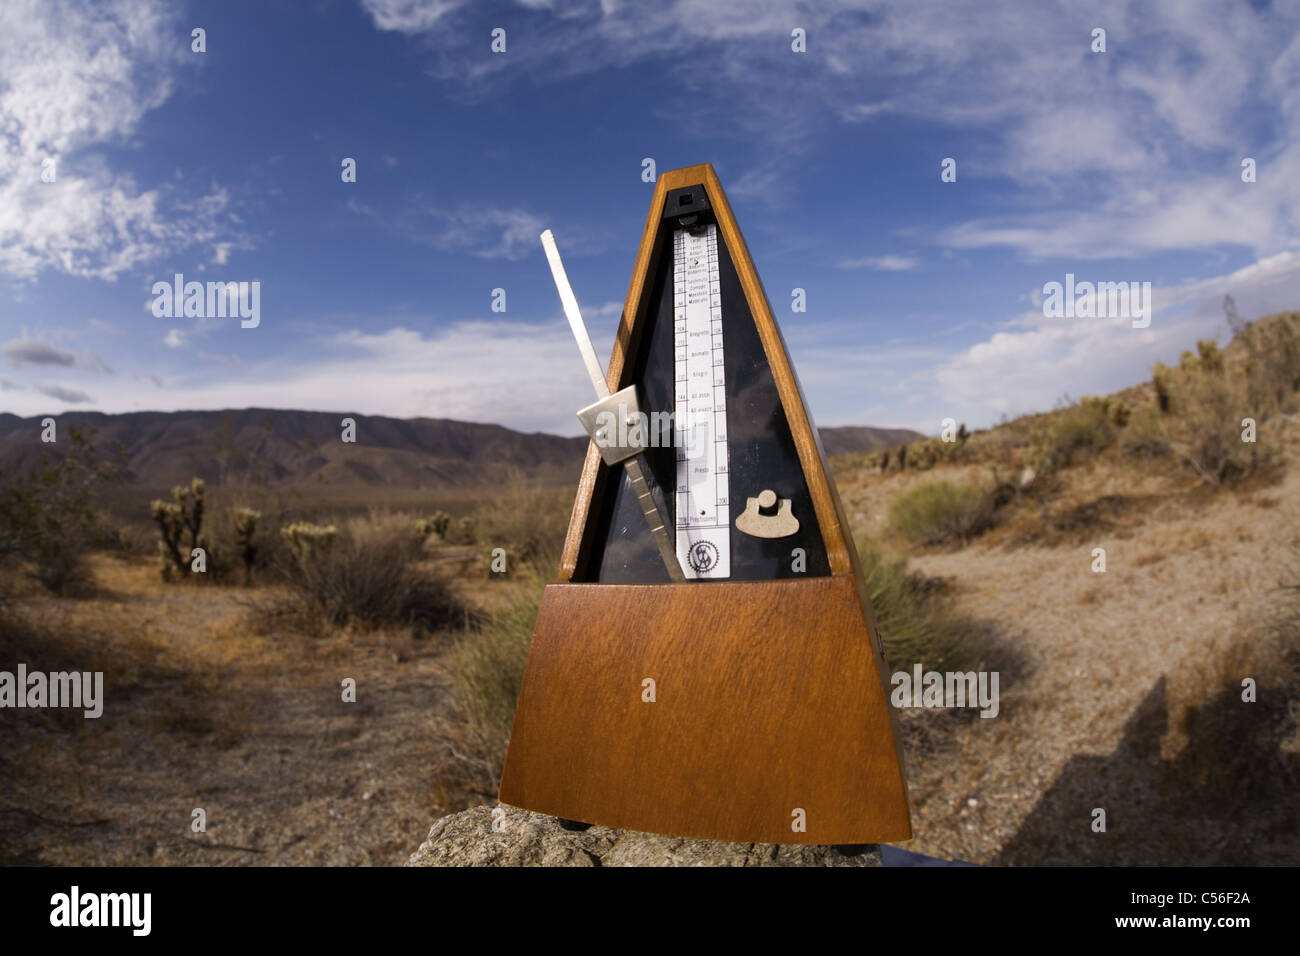 Metronome in Desert, USA - Stock Image